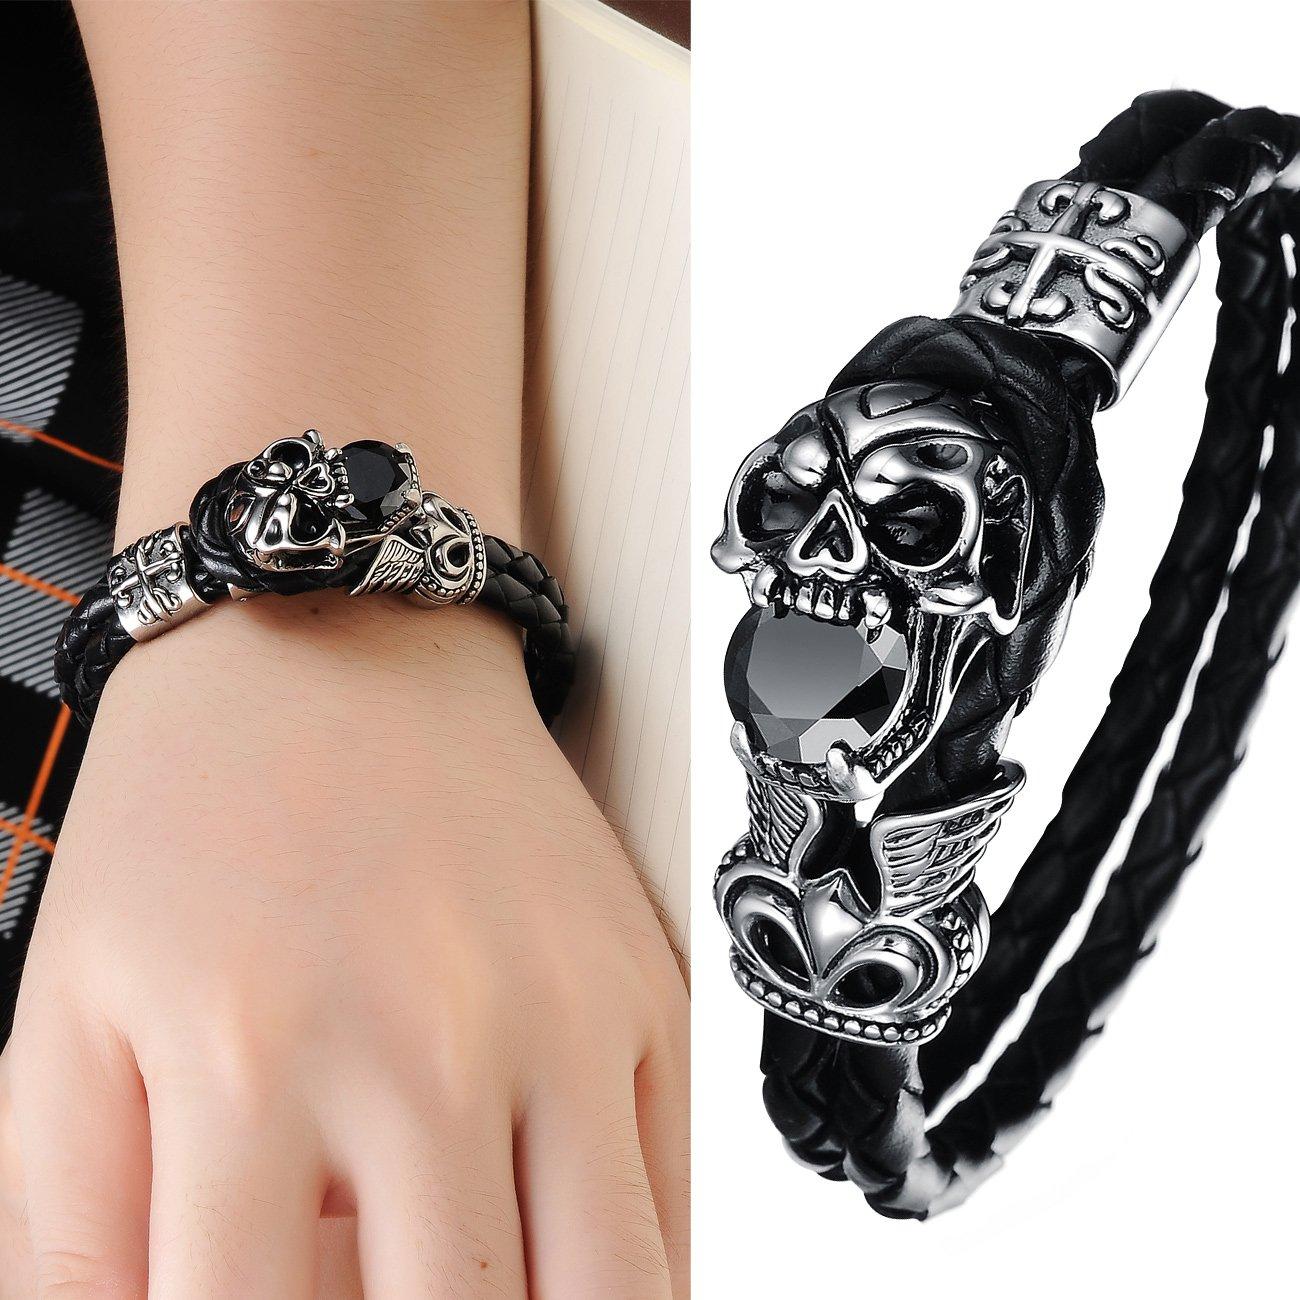 Keybella Bracelet PU Punk Rock Devil Skull Stainless Steel Silver Black Man Wristband Boys Gift